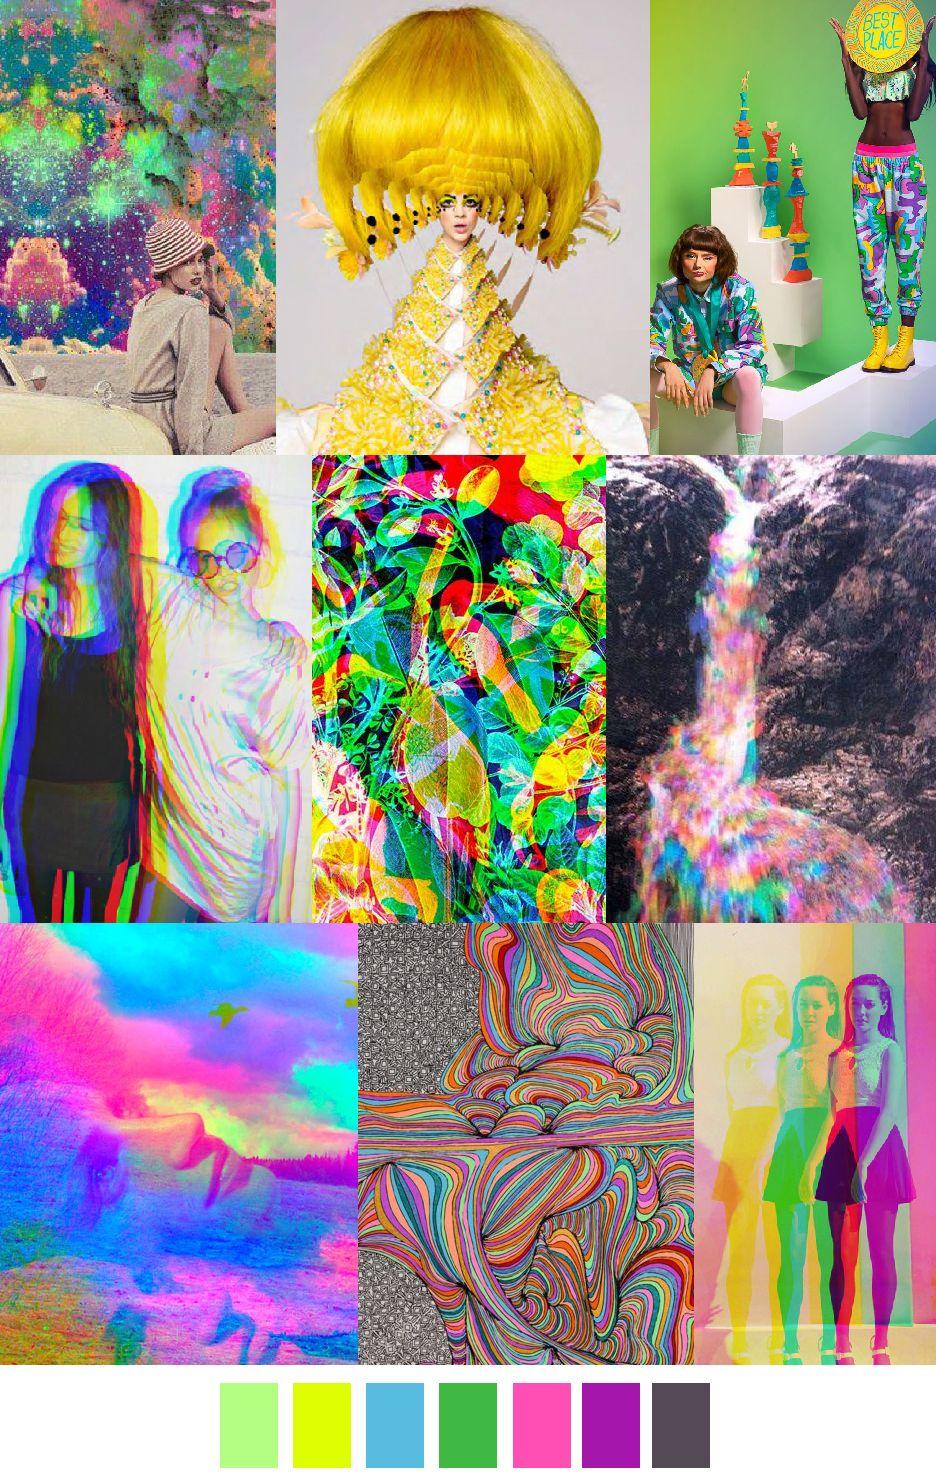 SEAFOAM SERENE | PF 2016 LUMINESCENCE | Acid trip, Colorful